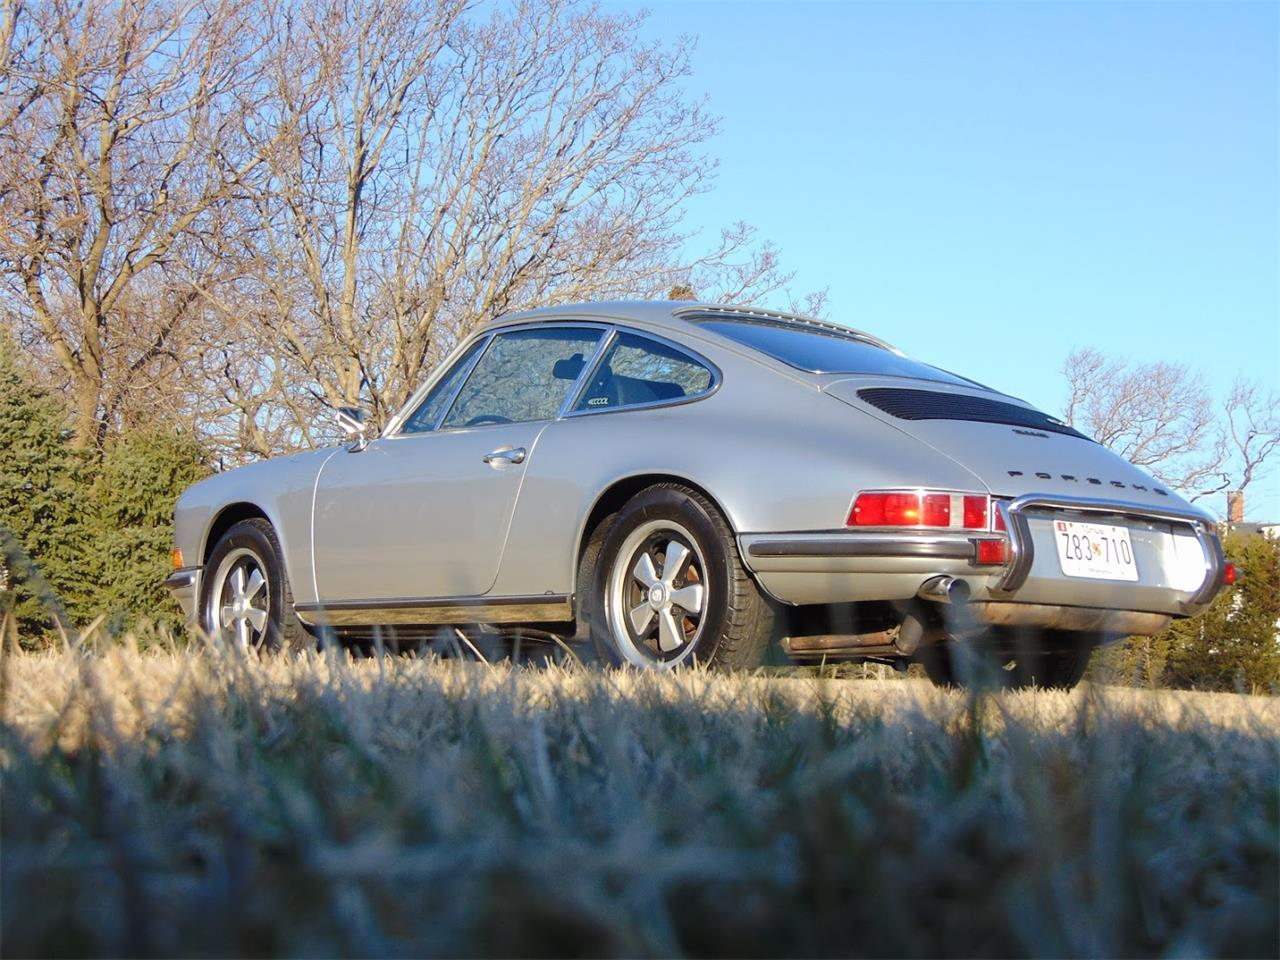 1972 Porsche 911S (CC-1215744) for sale in Neptune, New Jersey